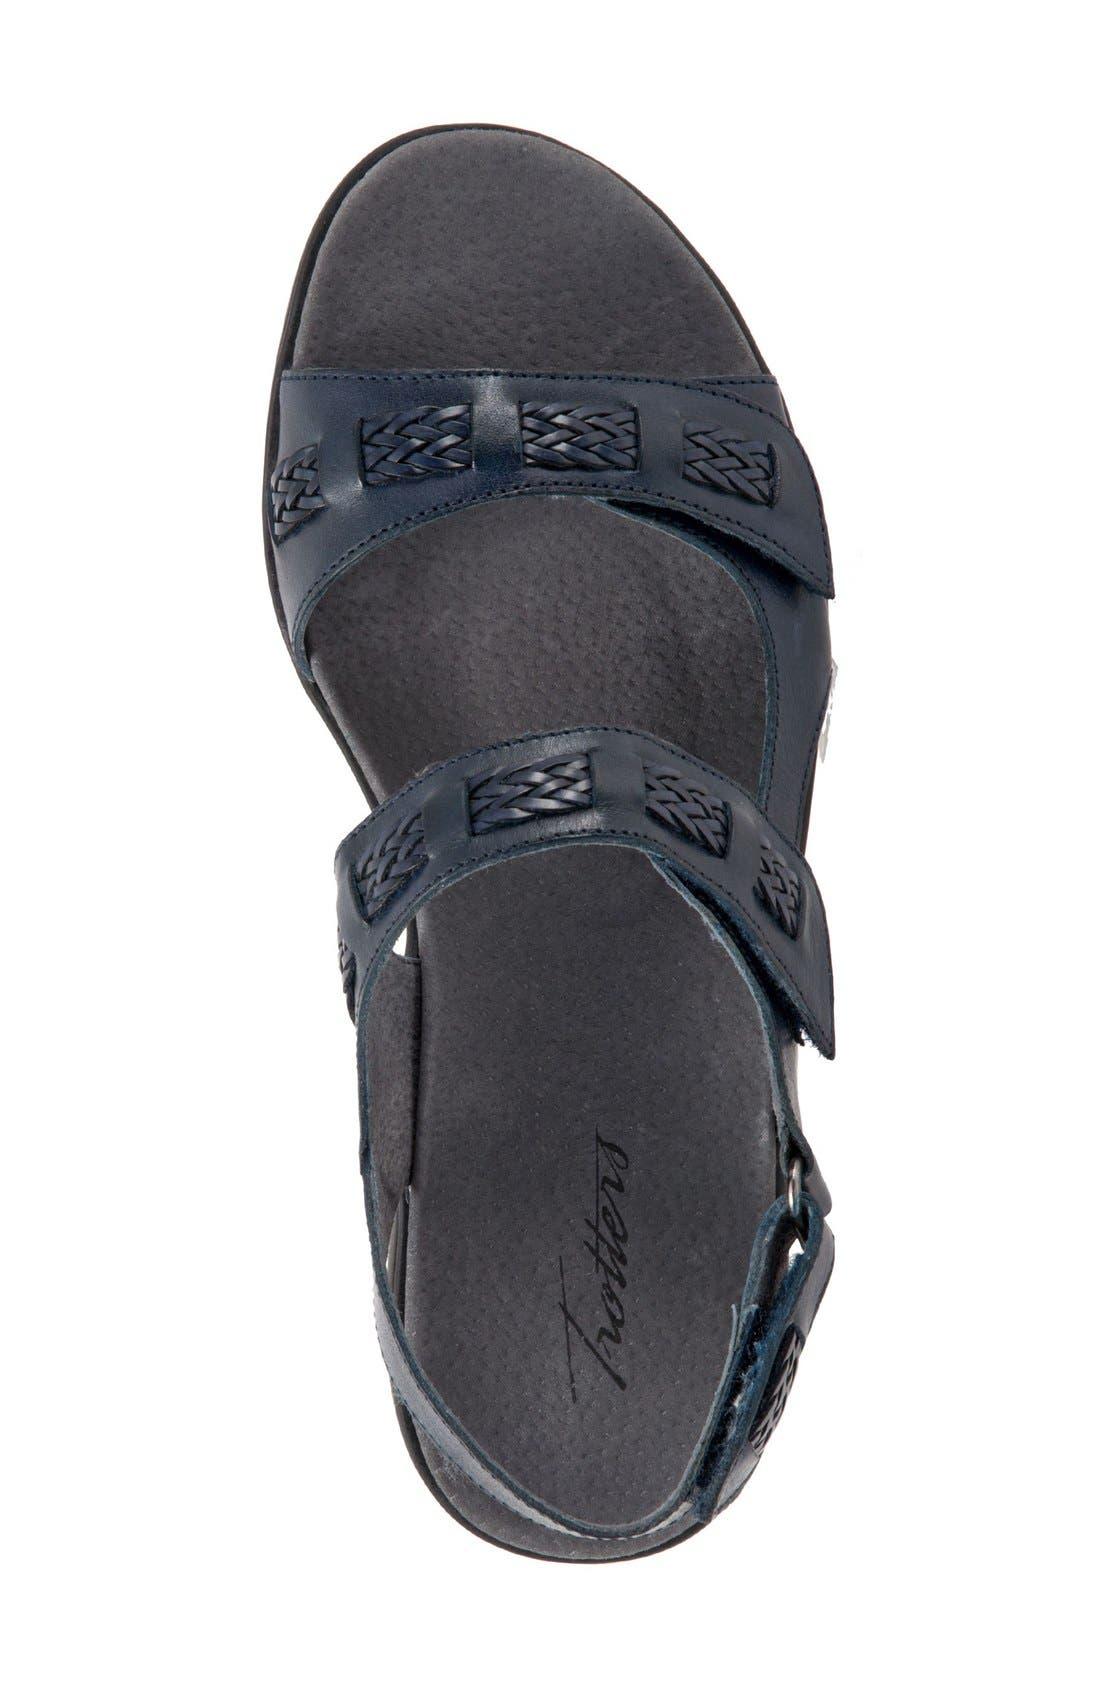 'Kip' Sandal,                             Alternate thumbnail 3, color,                             Navy Leather